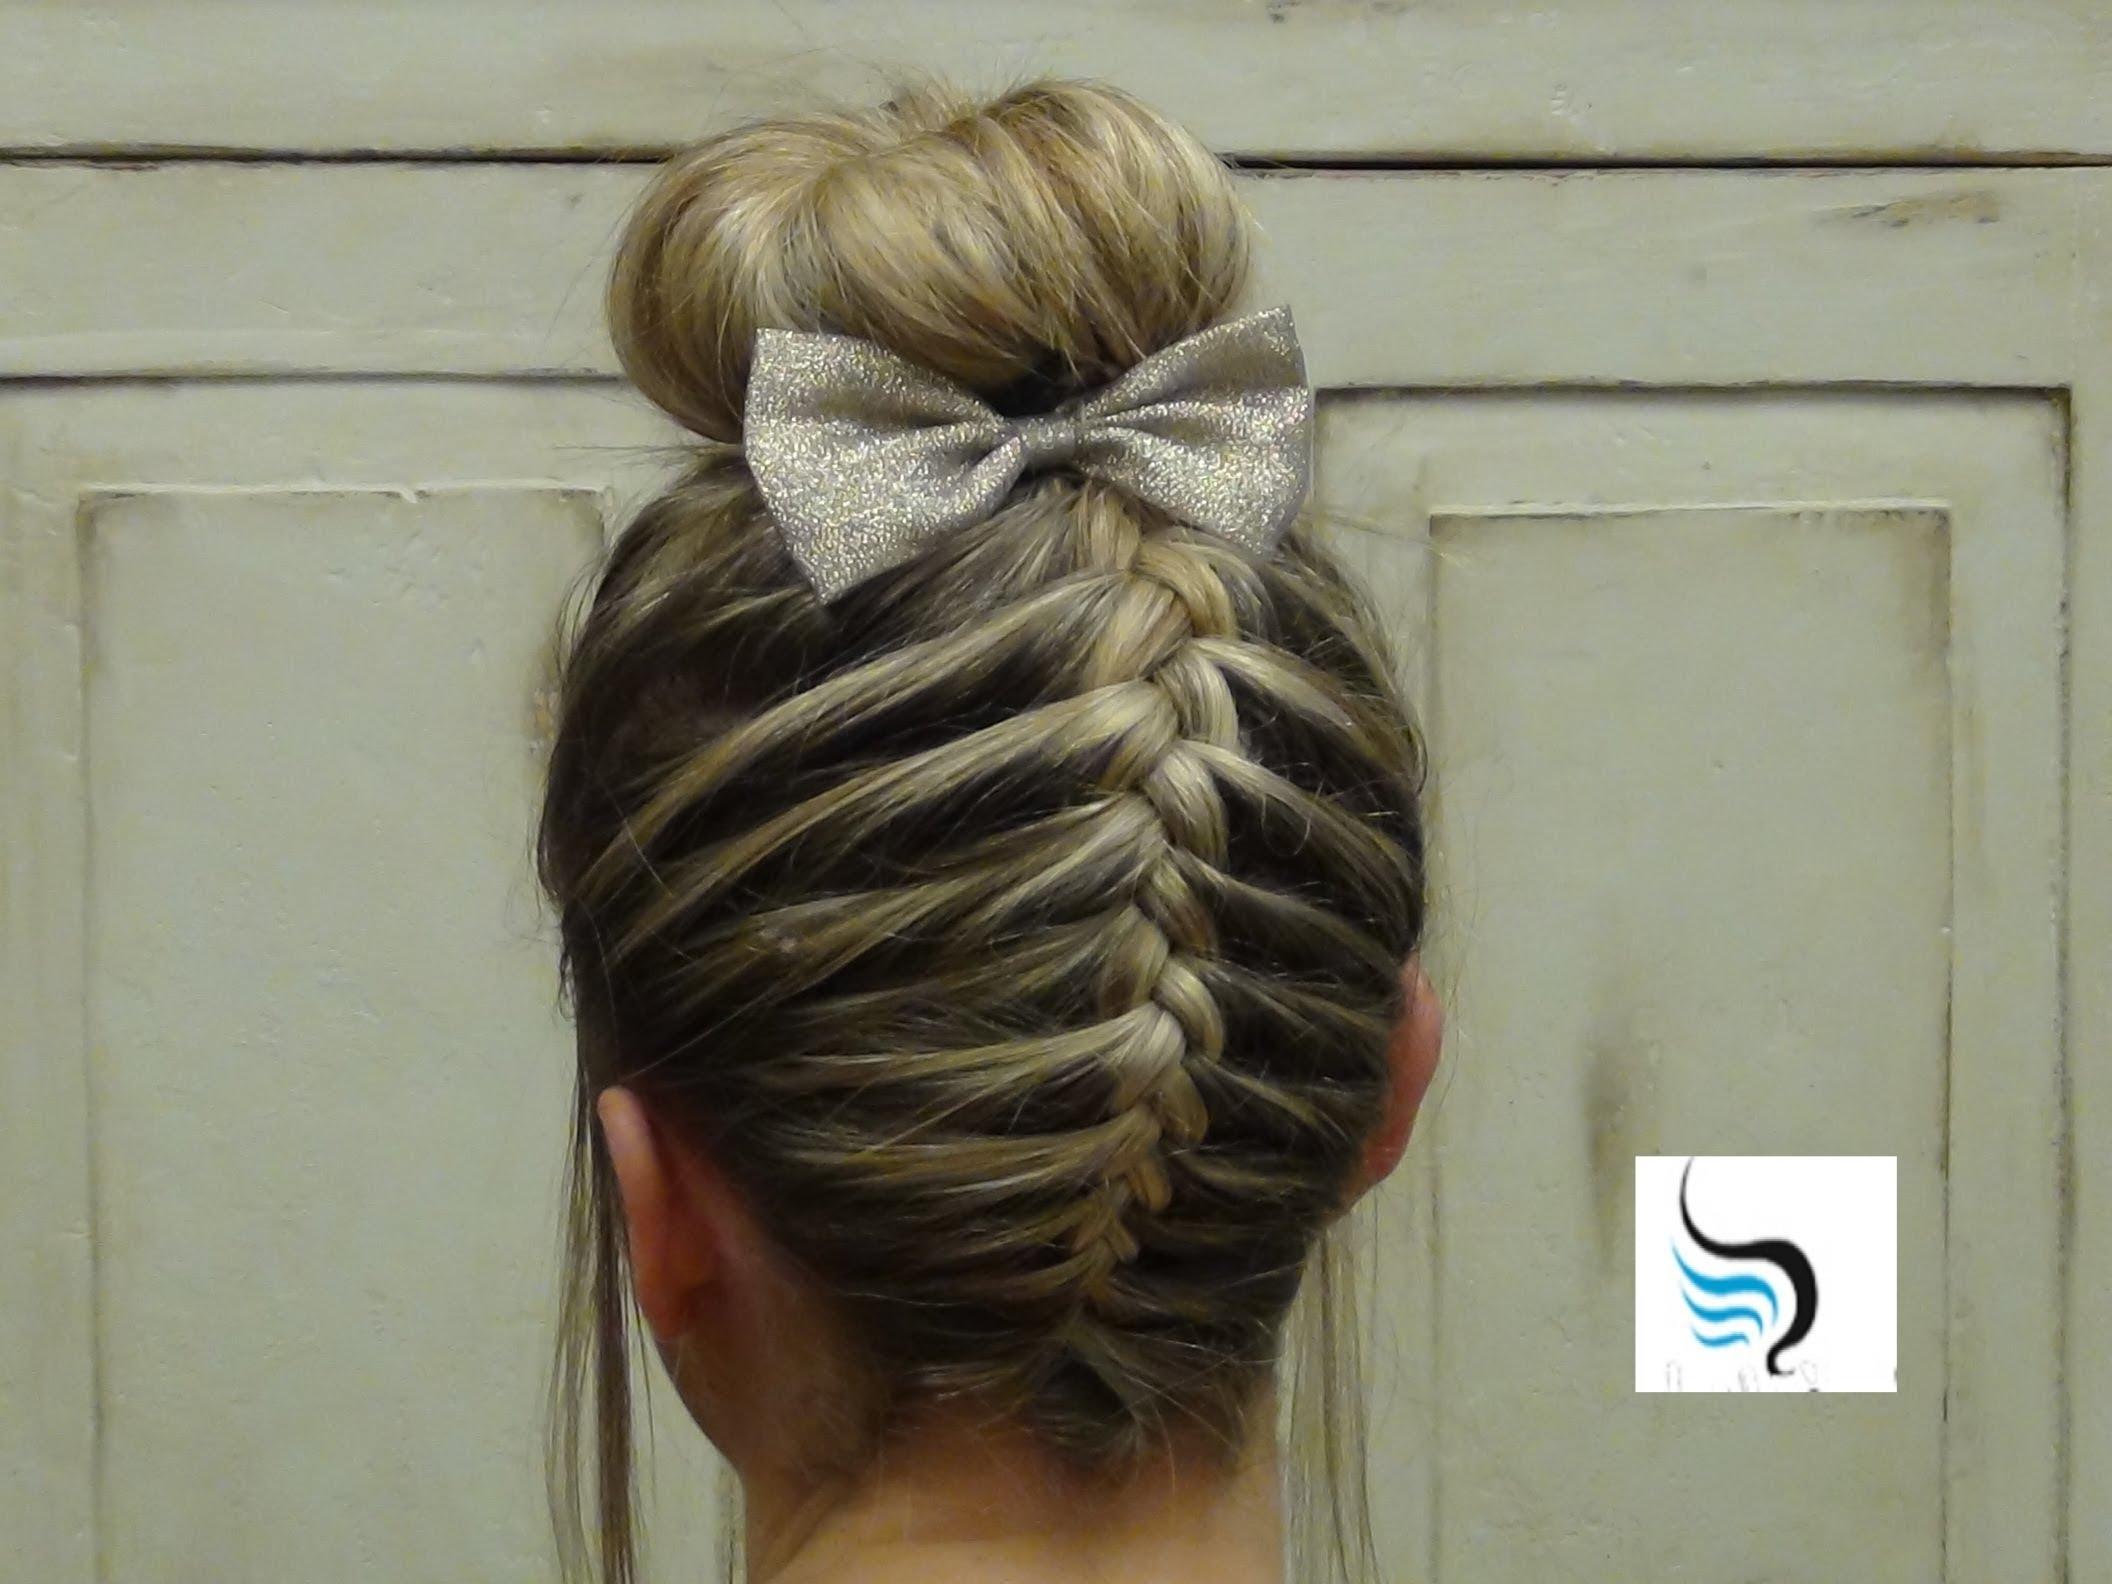 French Braid Sock Bun) Girls Hairstyles – Youtube Regarding Latest Braid Into Sock Bun (View 11 of 15)